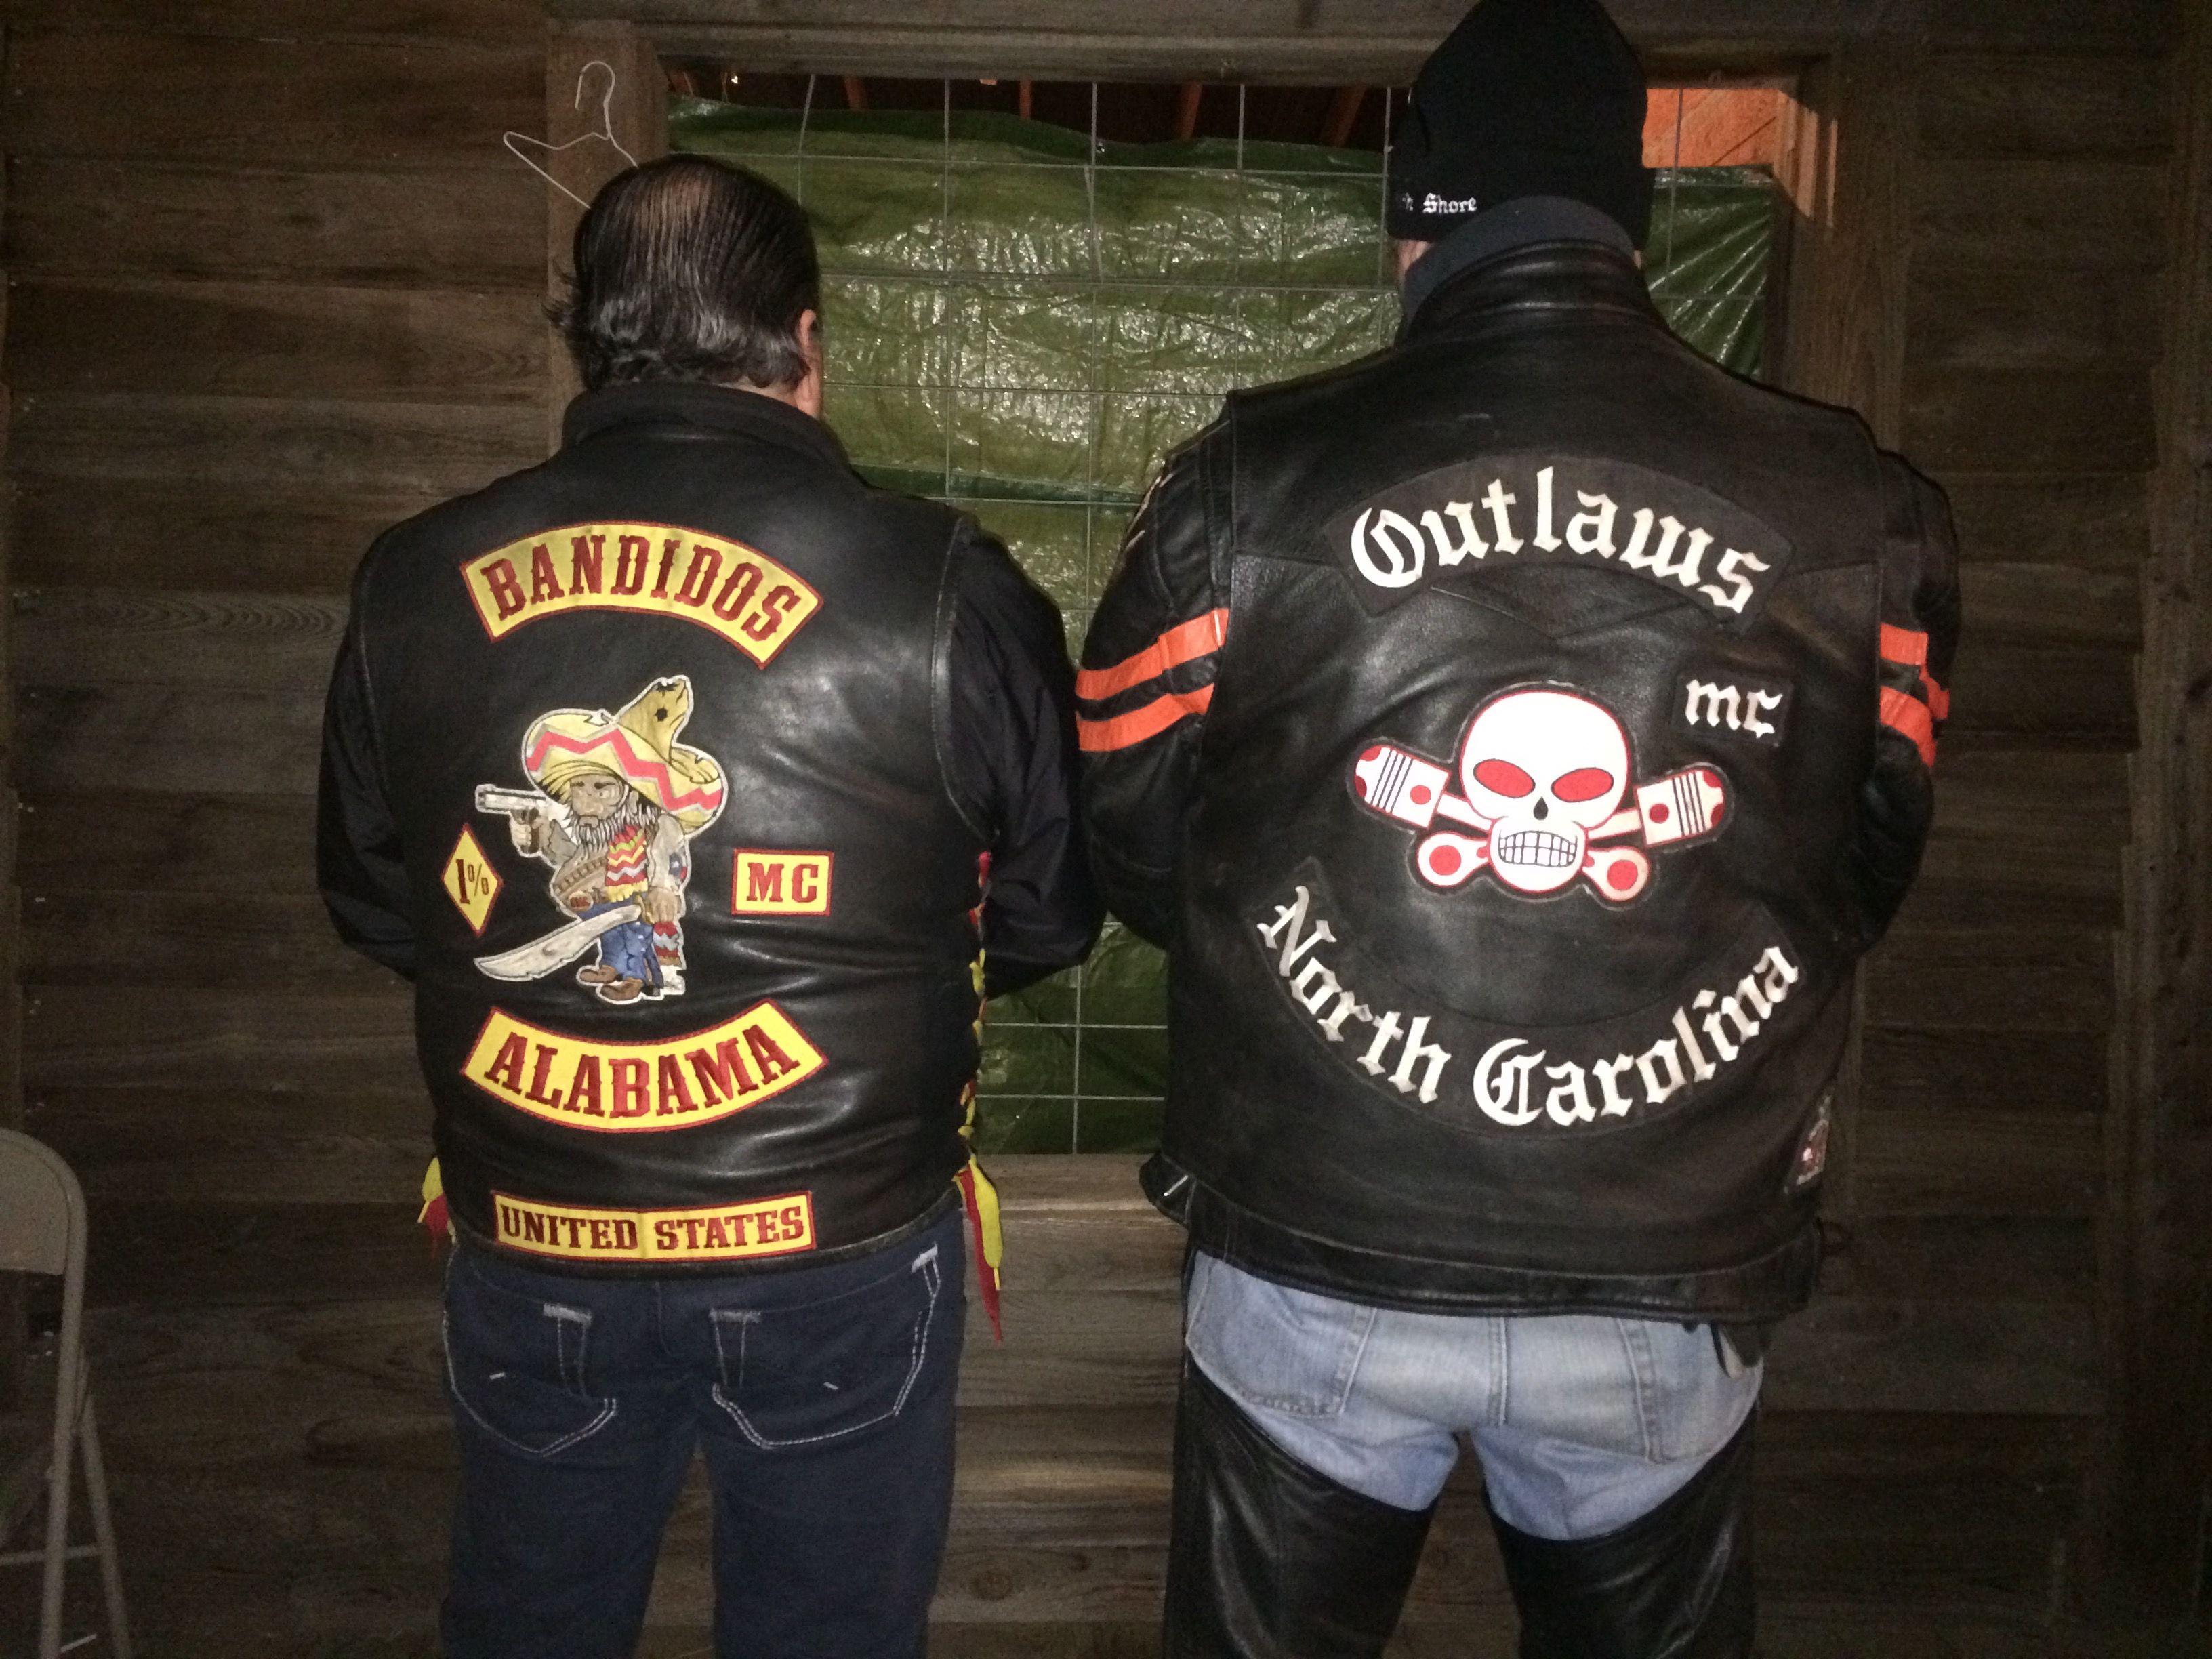 Outlaws MC, Bandidos MC | Biker | Outlaws motorcycle club